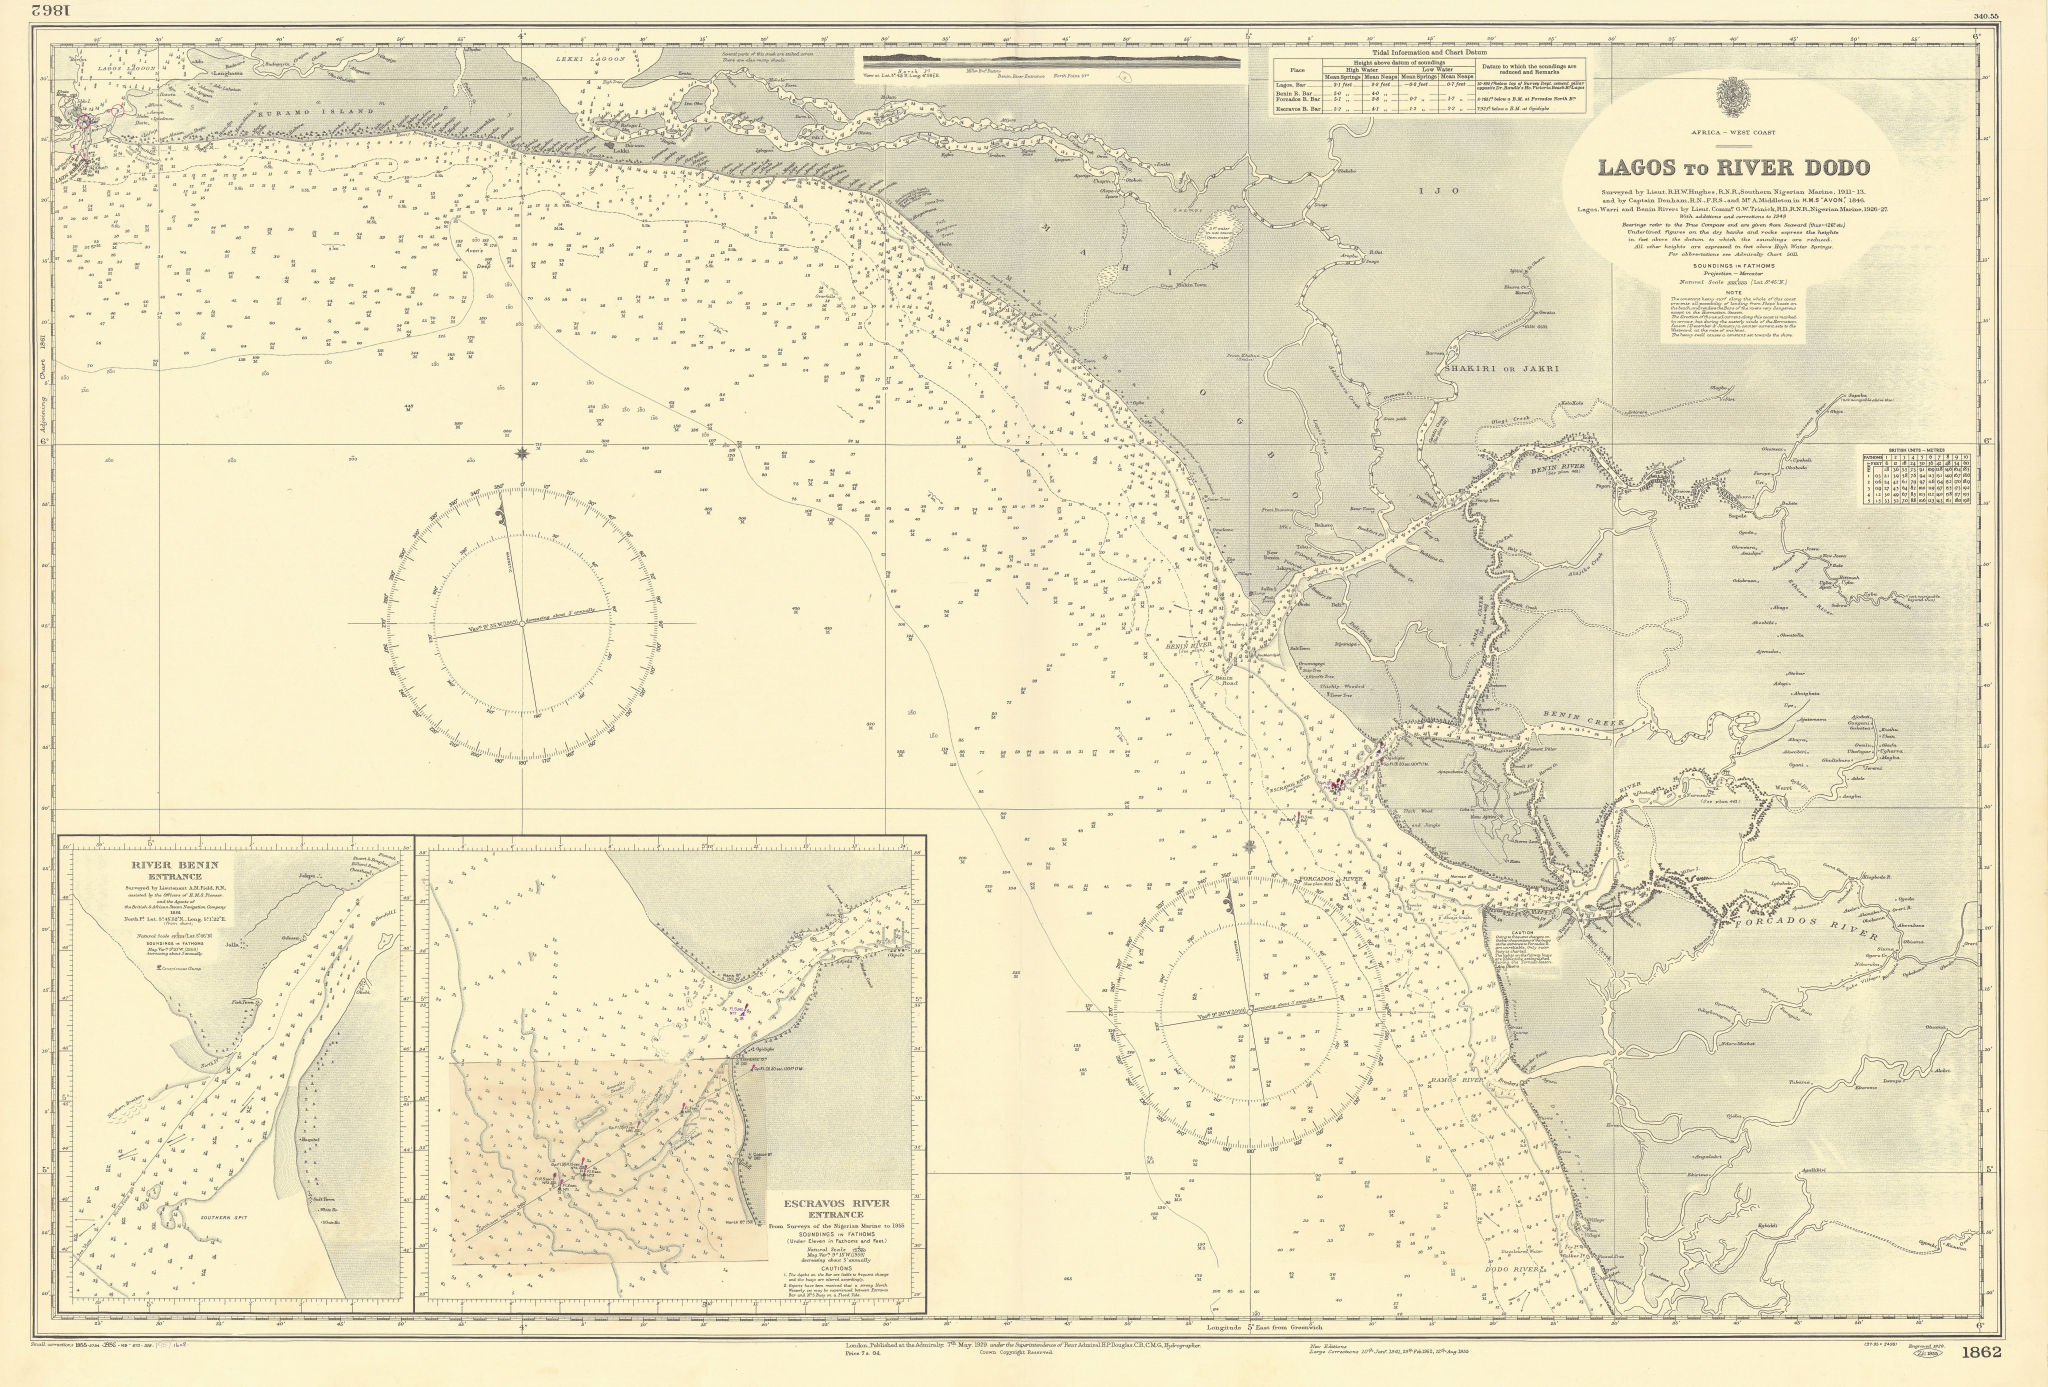 Nigeria W coast Lagos-Dodo Benin Escravos Rivers ADMIRALTY chart 1929 (1957) map